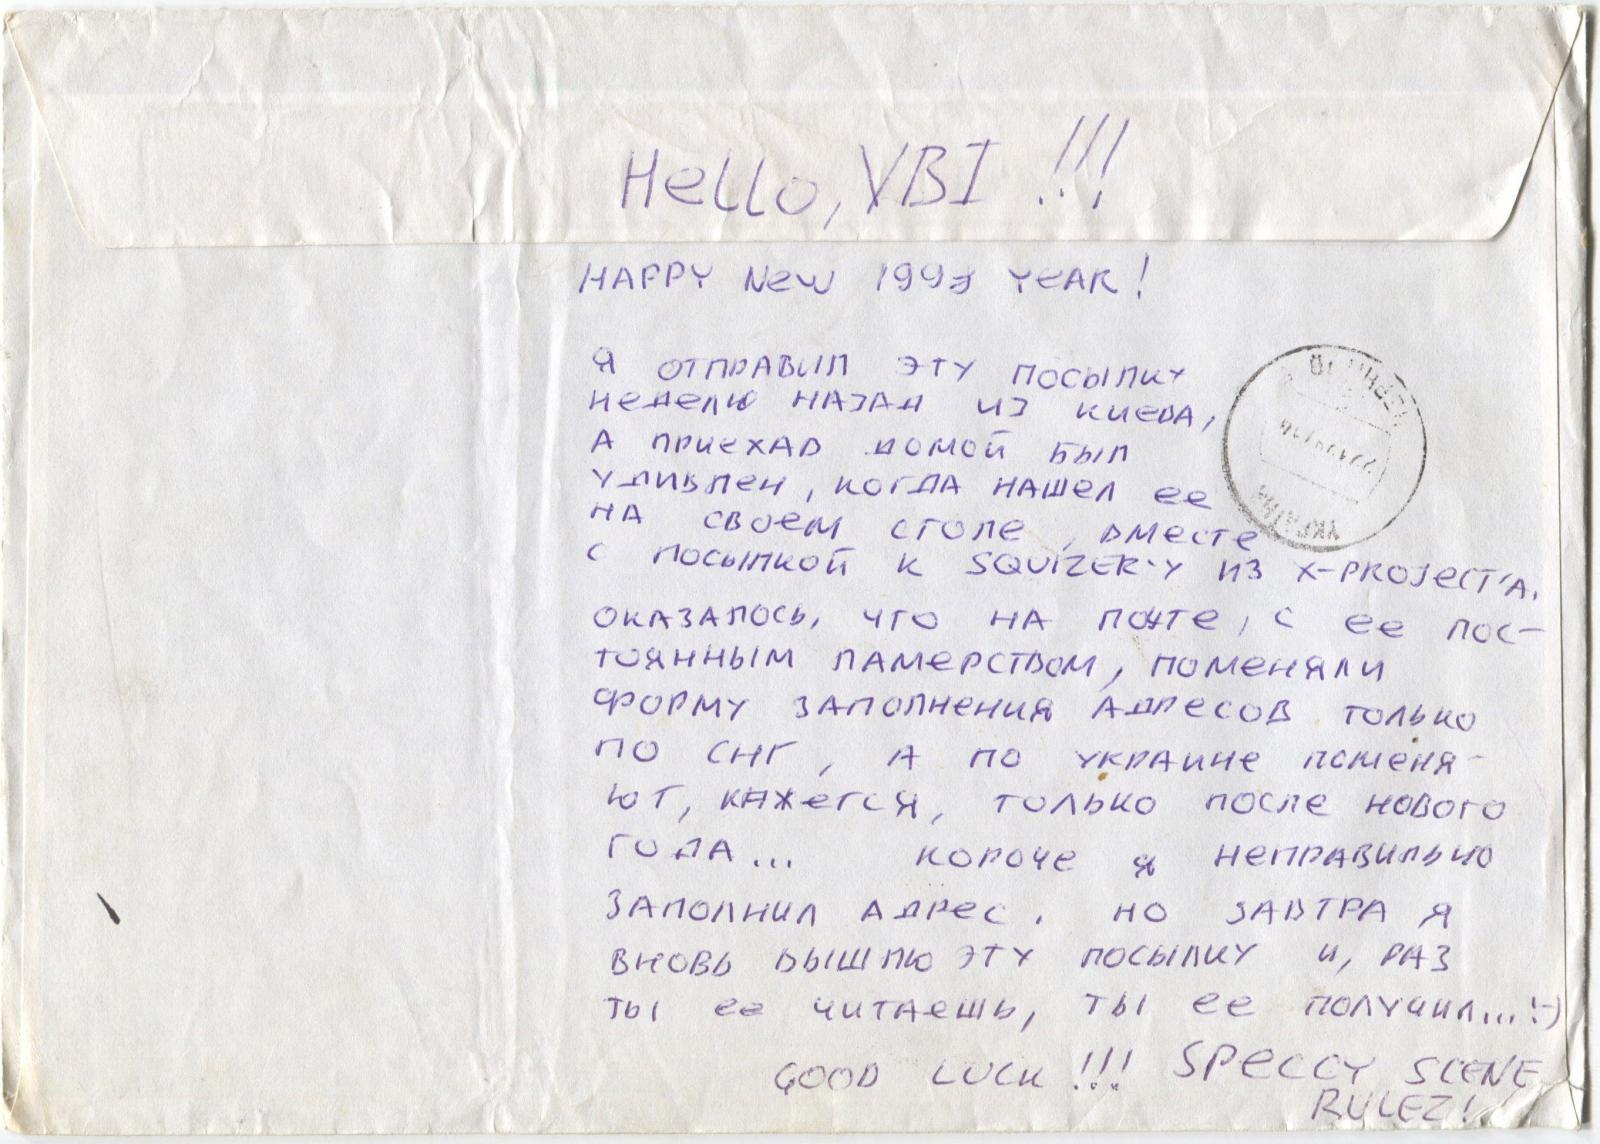 http://zxaaa.net/store/images/viator_to_vbi_19971219_0envelope.jpg